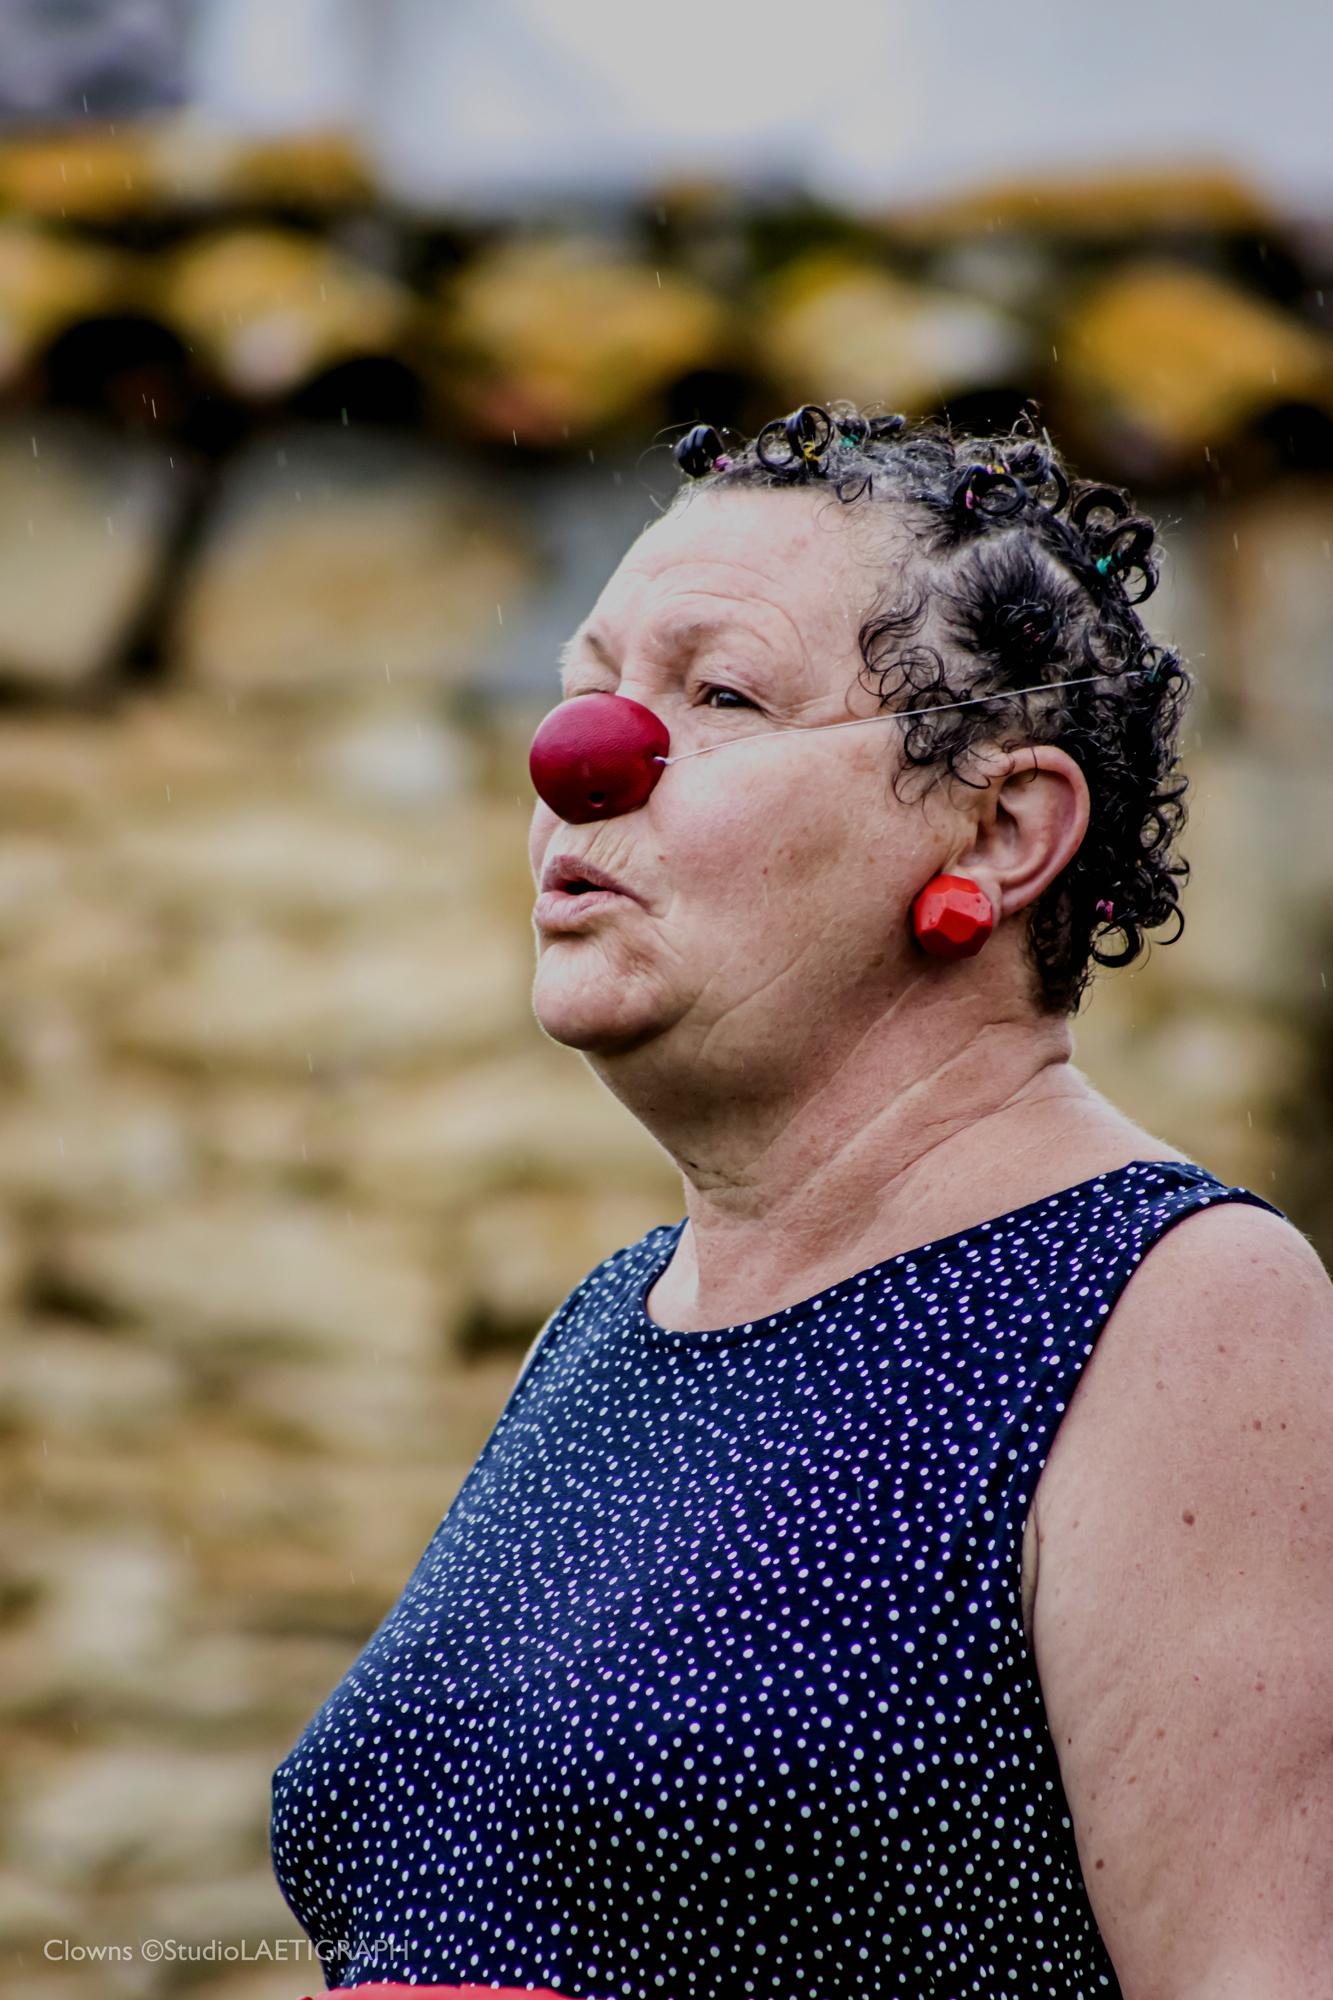 LMDCB21_clowns-84_1